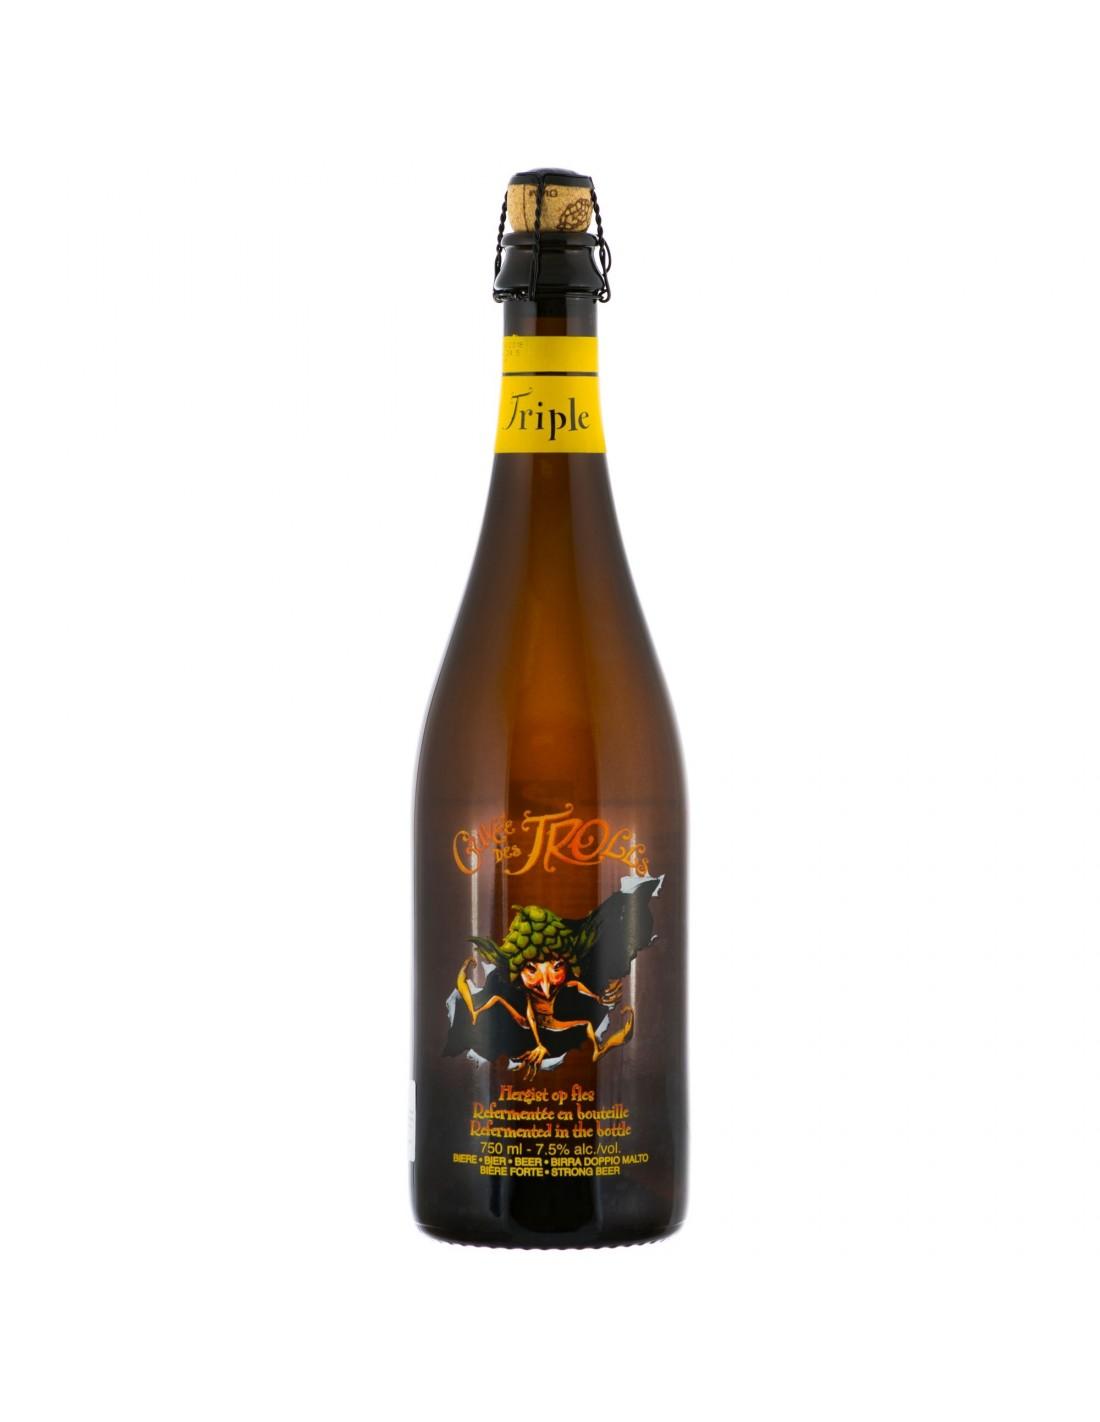 Bere bruna Cuvee Des Trolls, 6.3% alc., 0.75L, Belgia